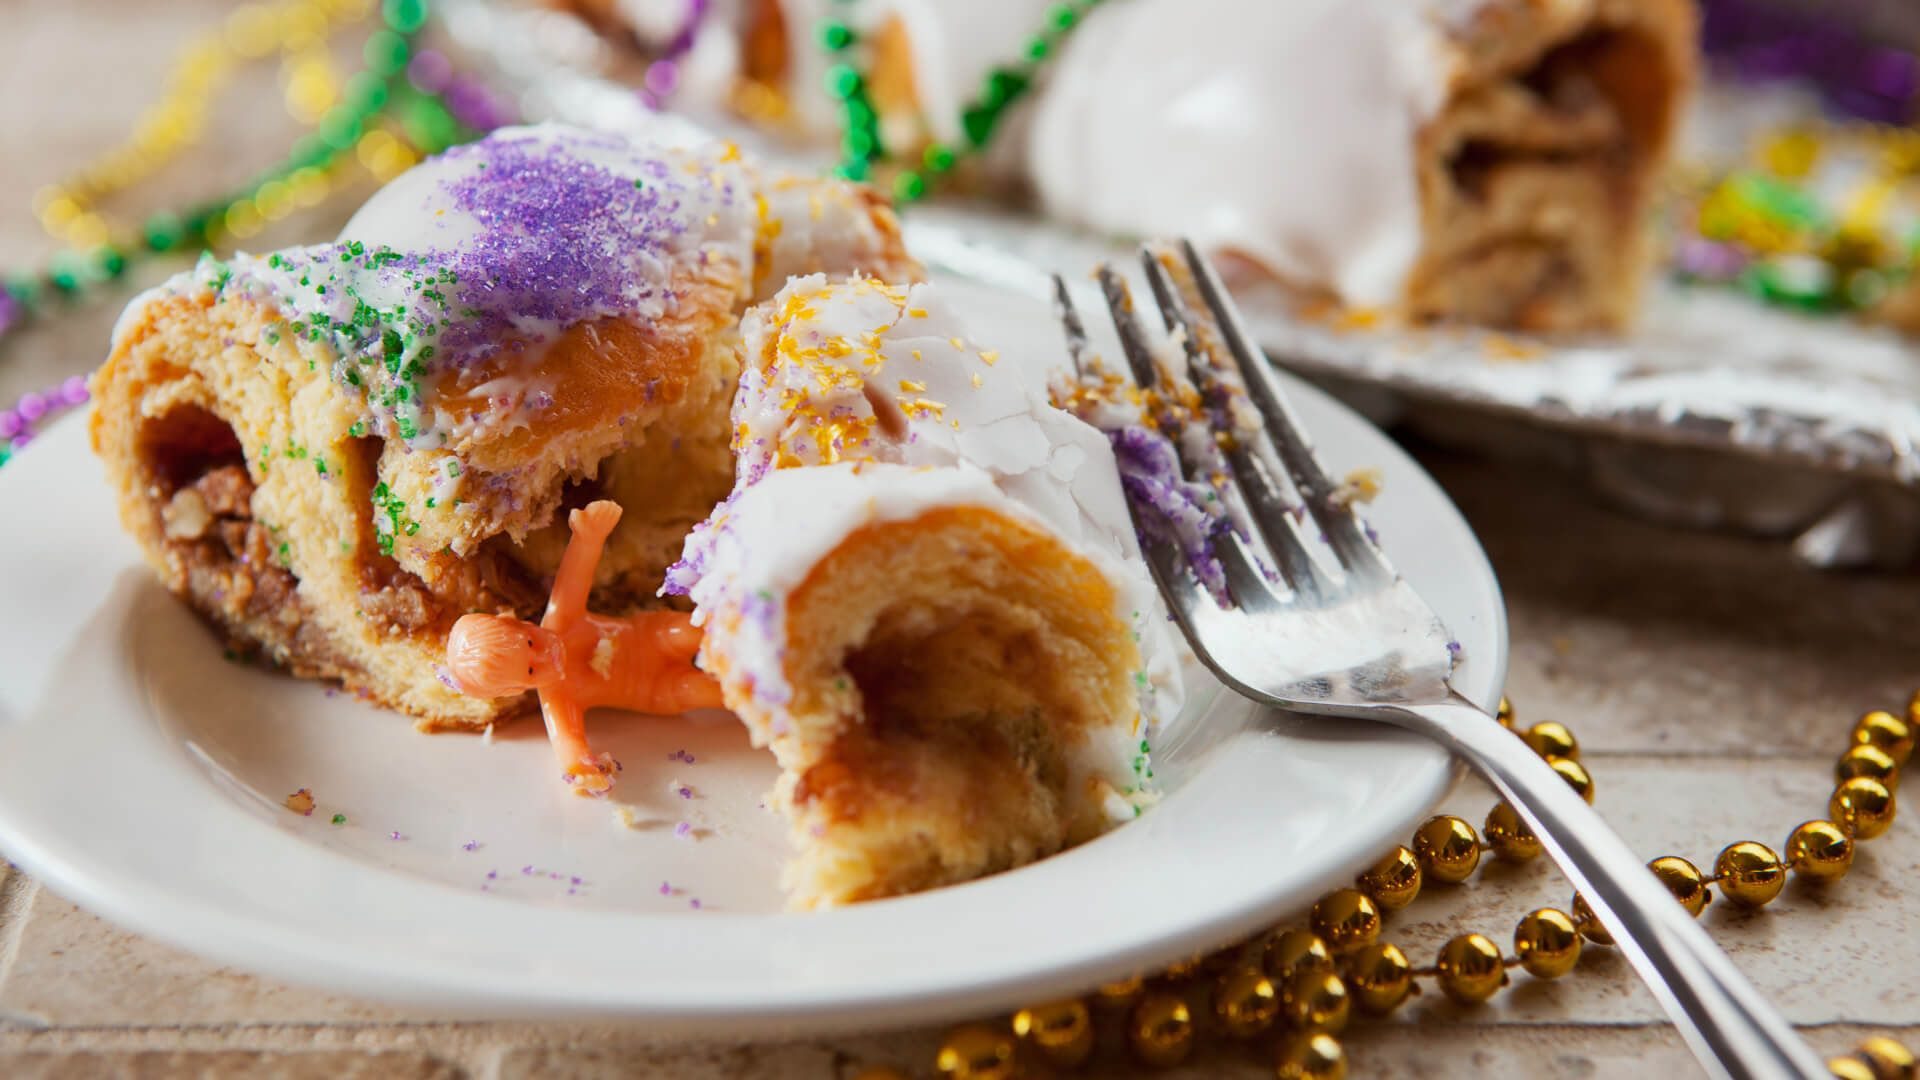 Mardi Gras Baby Jesus Toy From Inside Piece Of King Cake